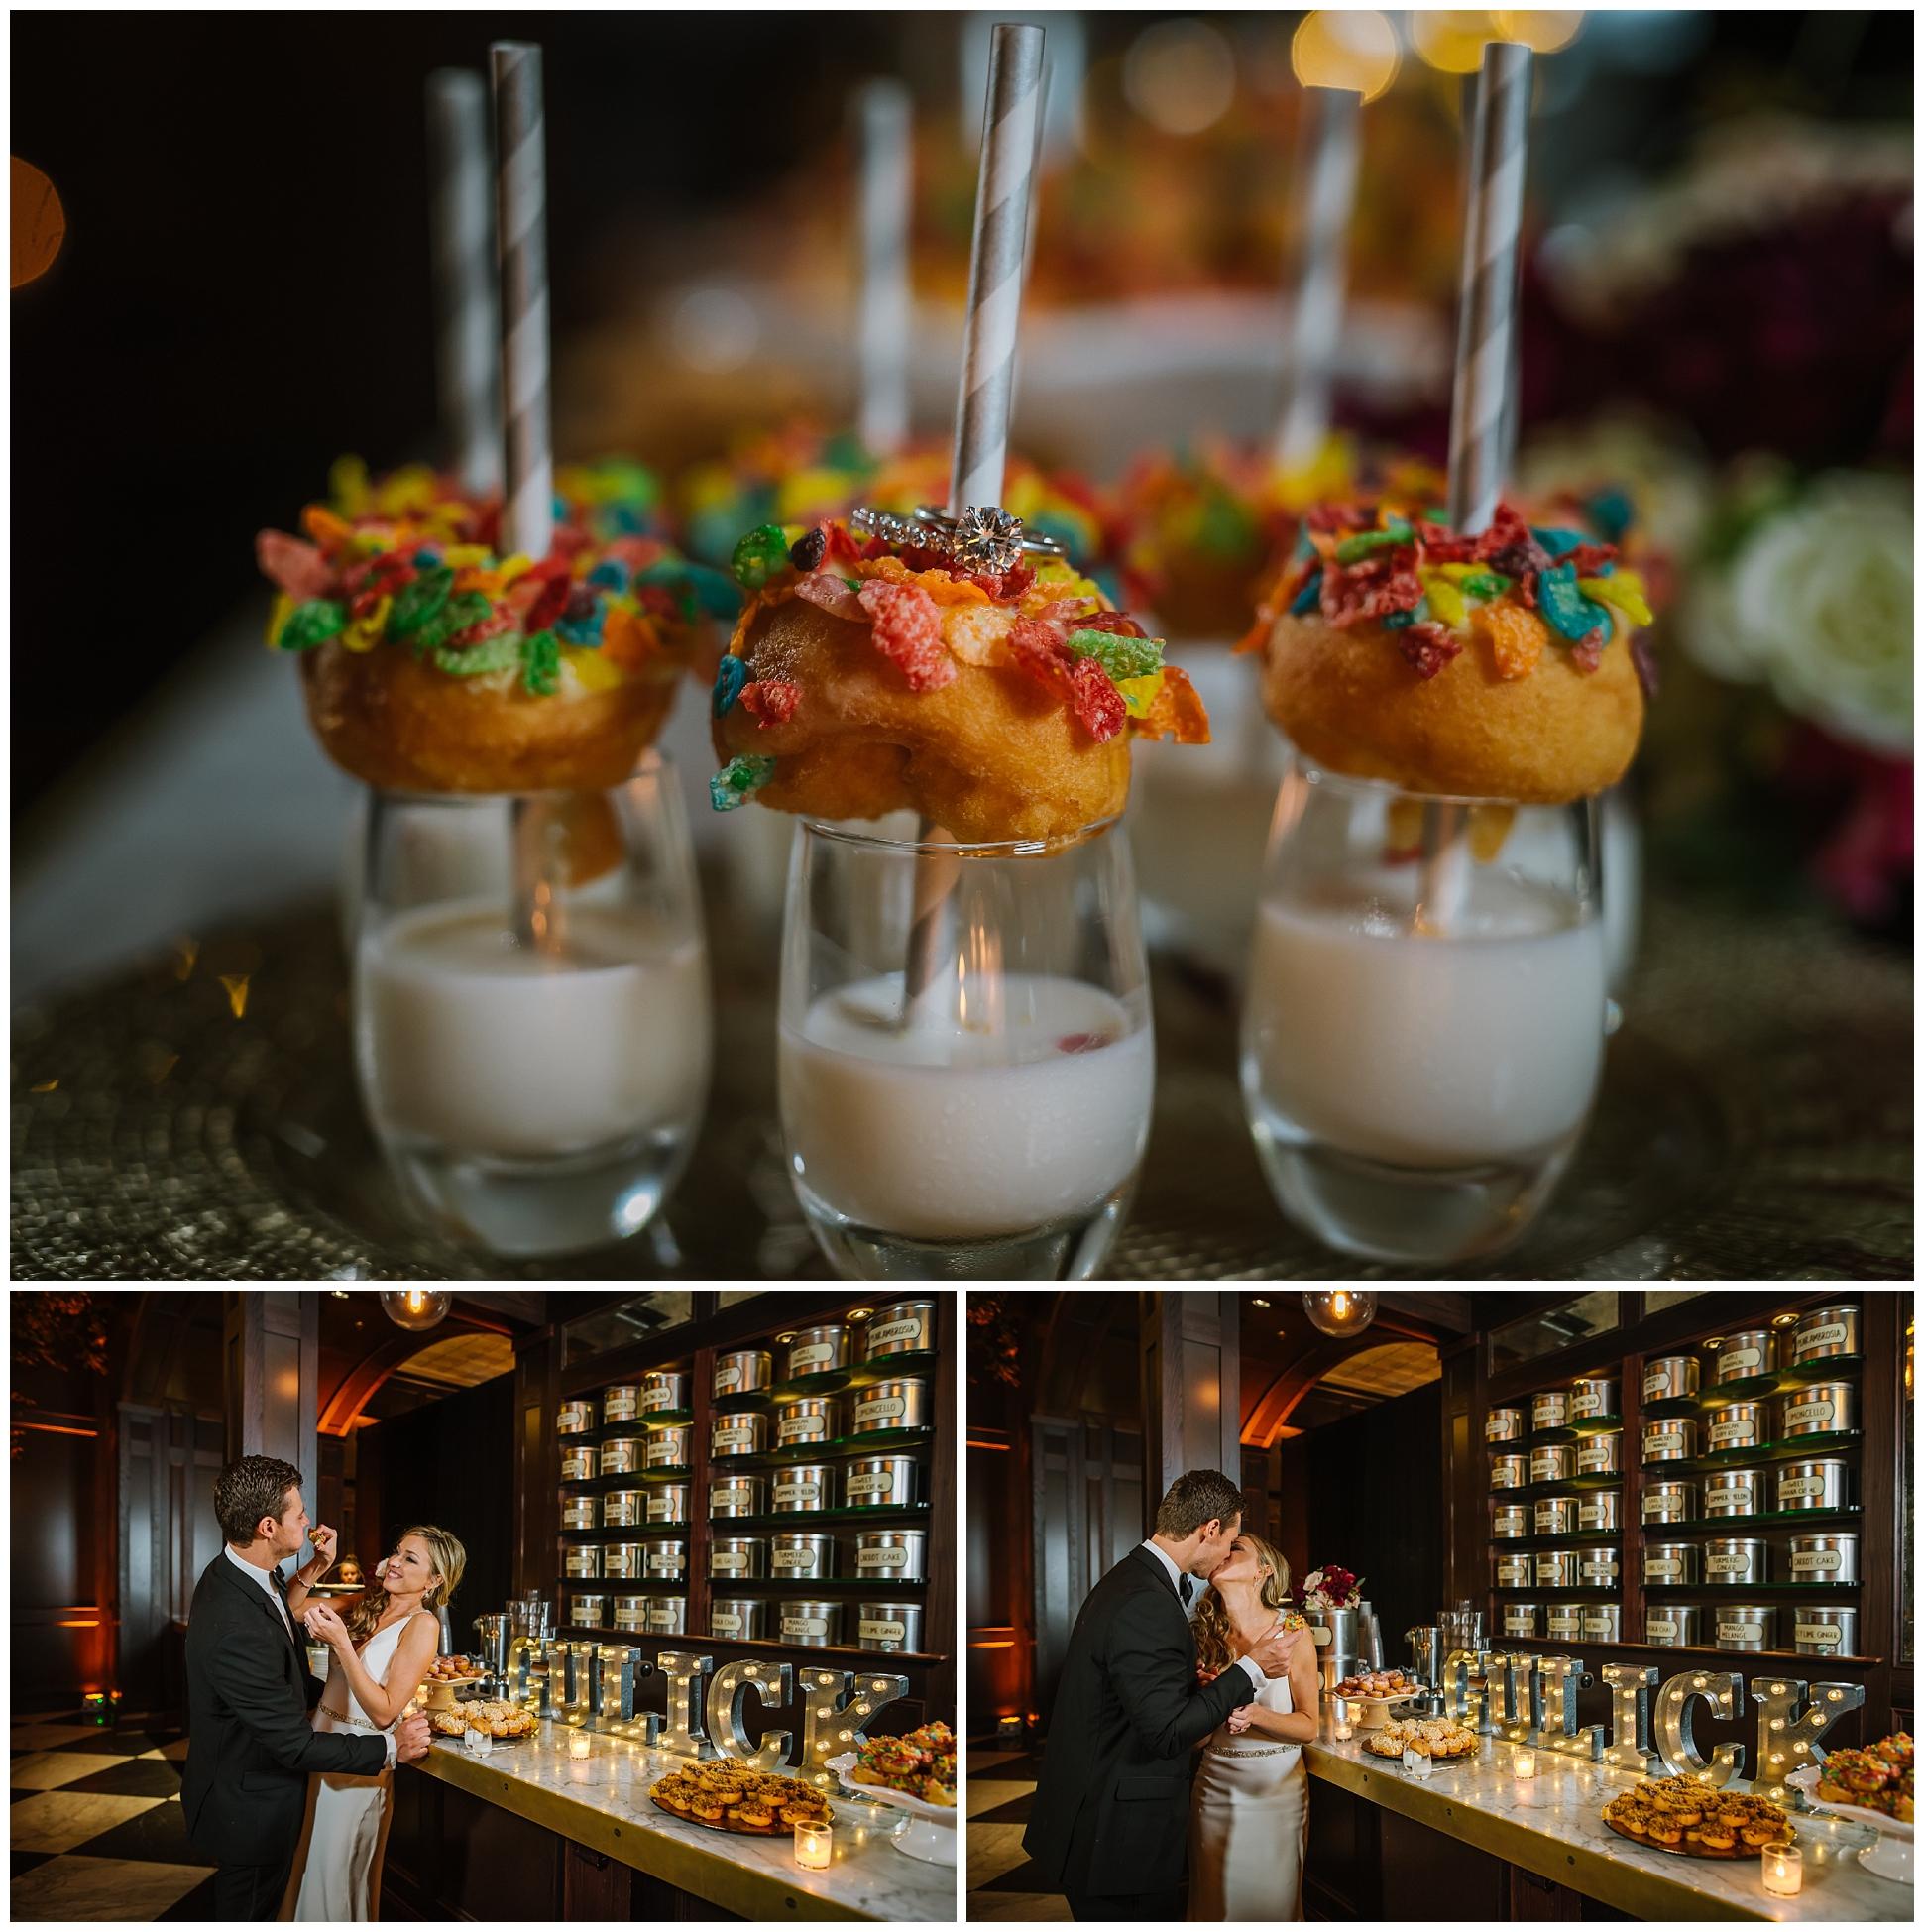 Oxford-exchange-wedding-photogapher-garland-candels-bookstore-burgandy-botanica_0058.jpg